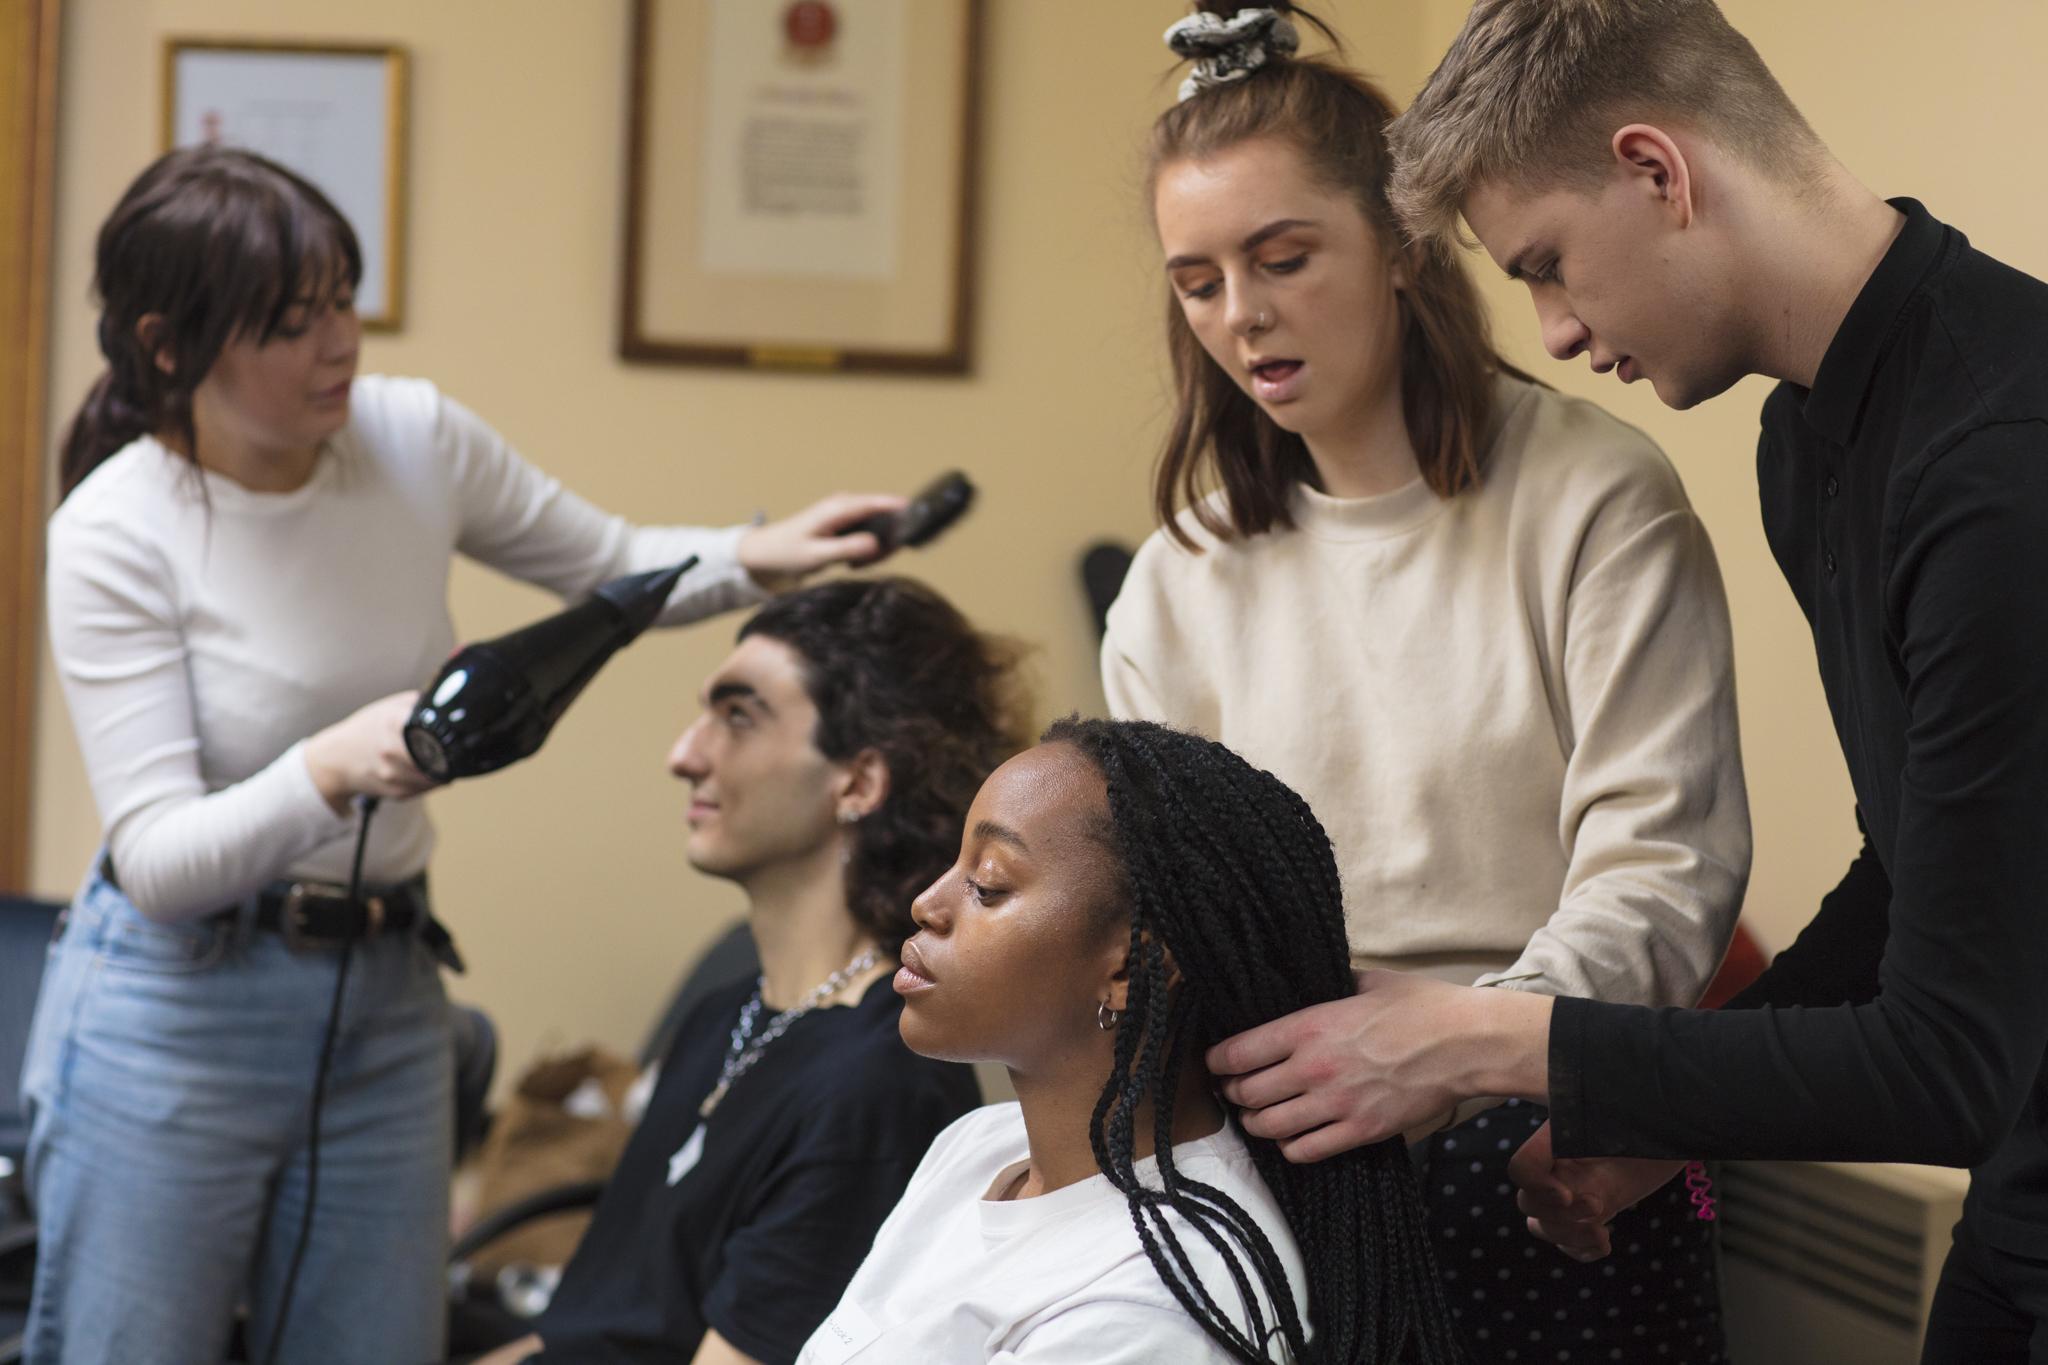 BTS hair stylists Aberdeen Fashion Show 2019_4.JPG